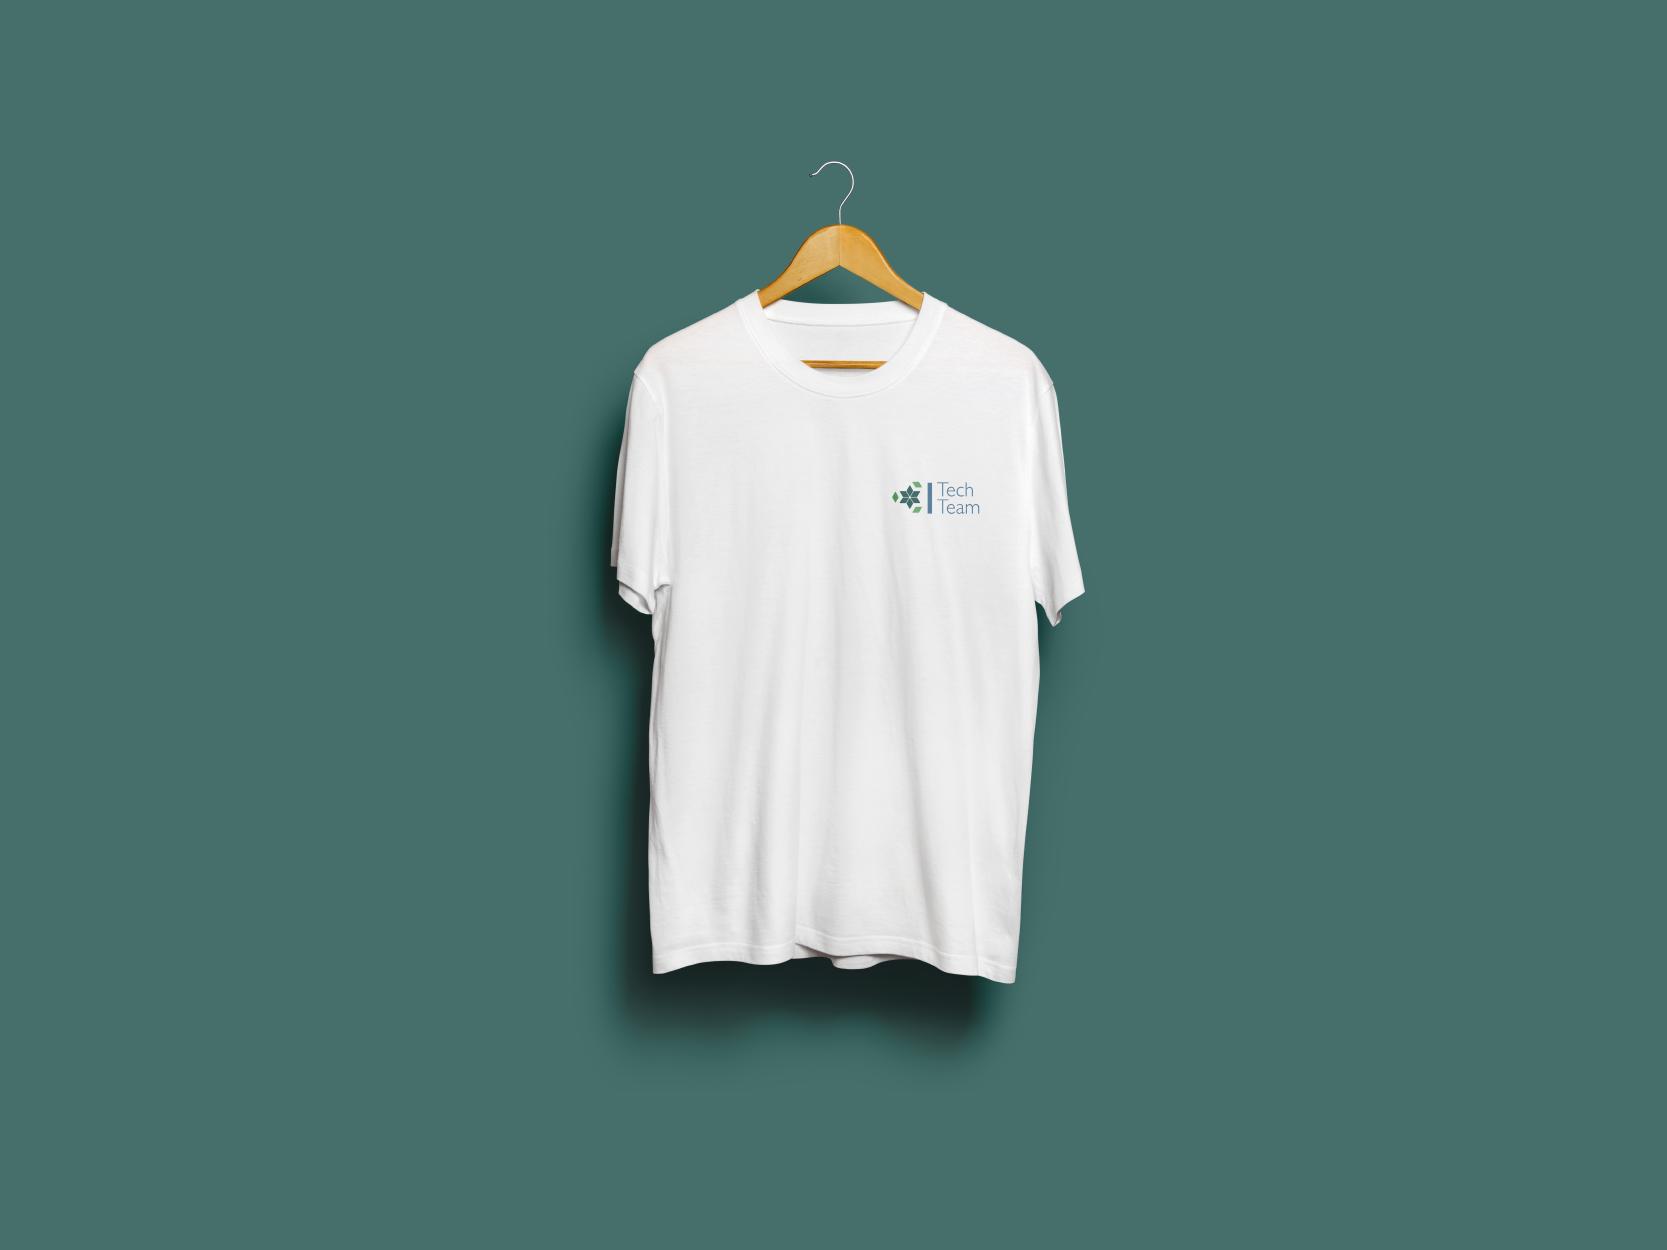 engineering tech company t-shirt